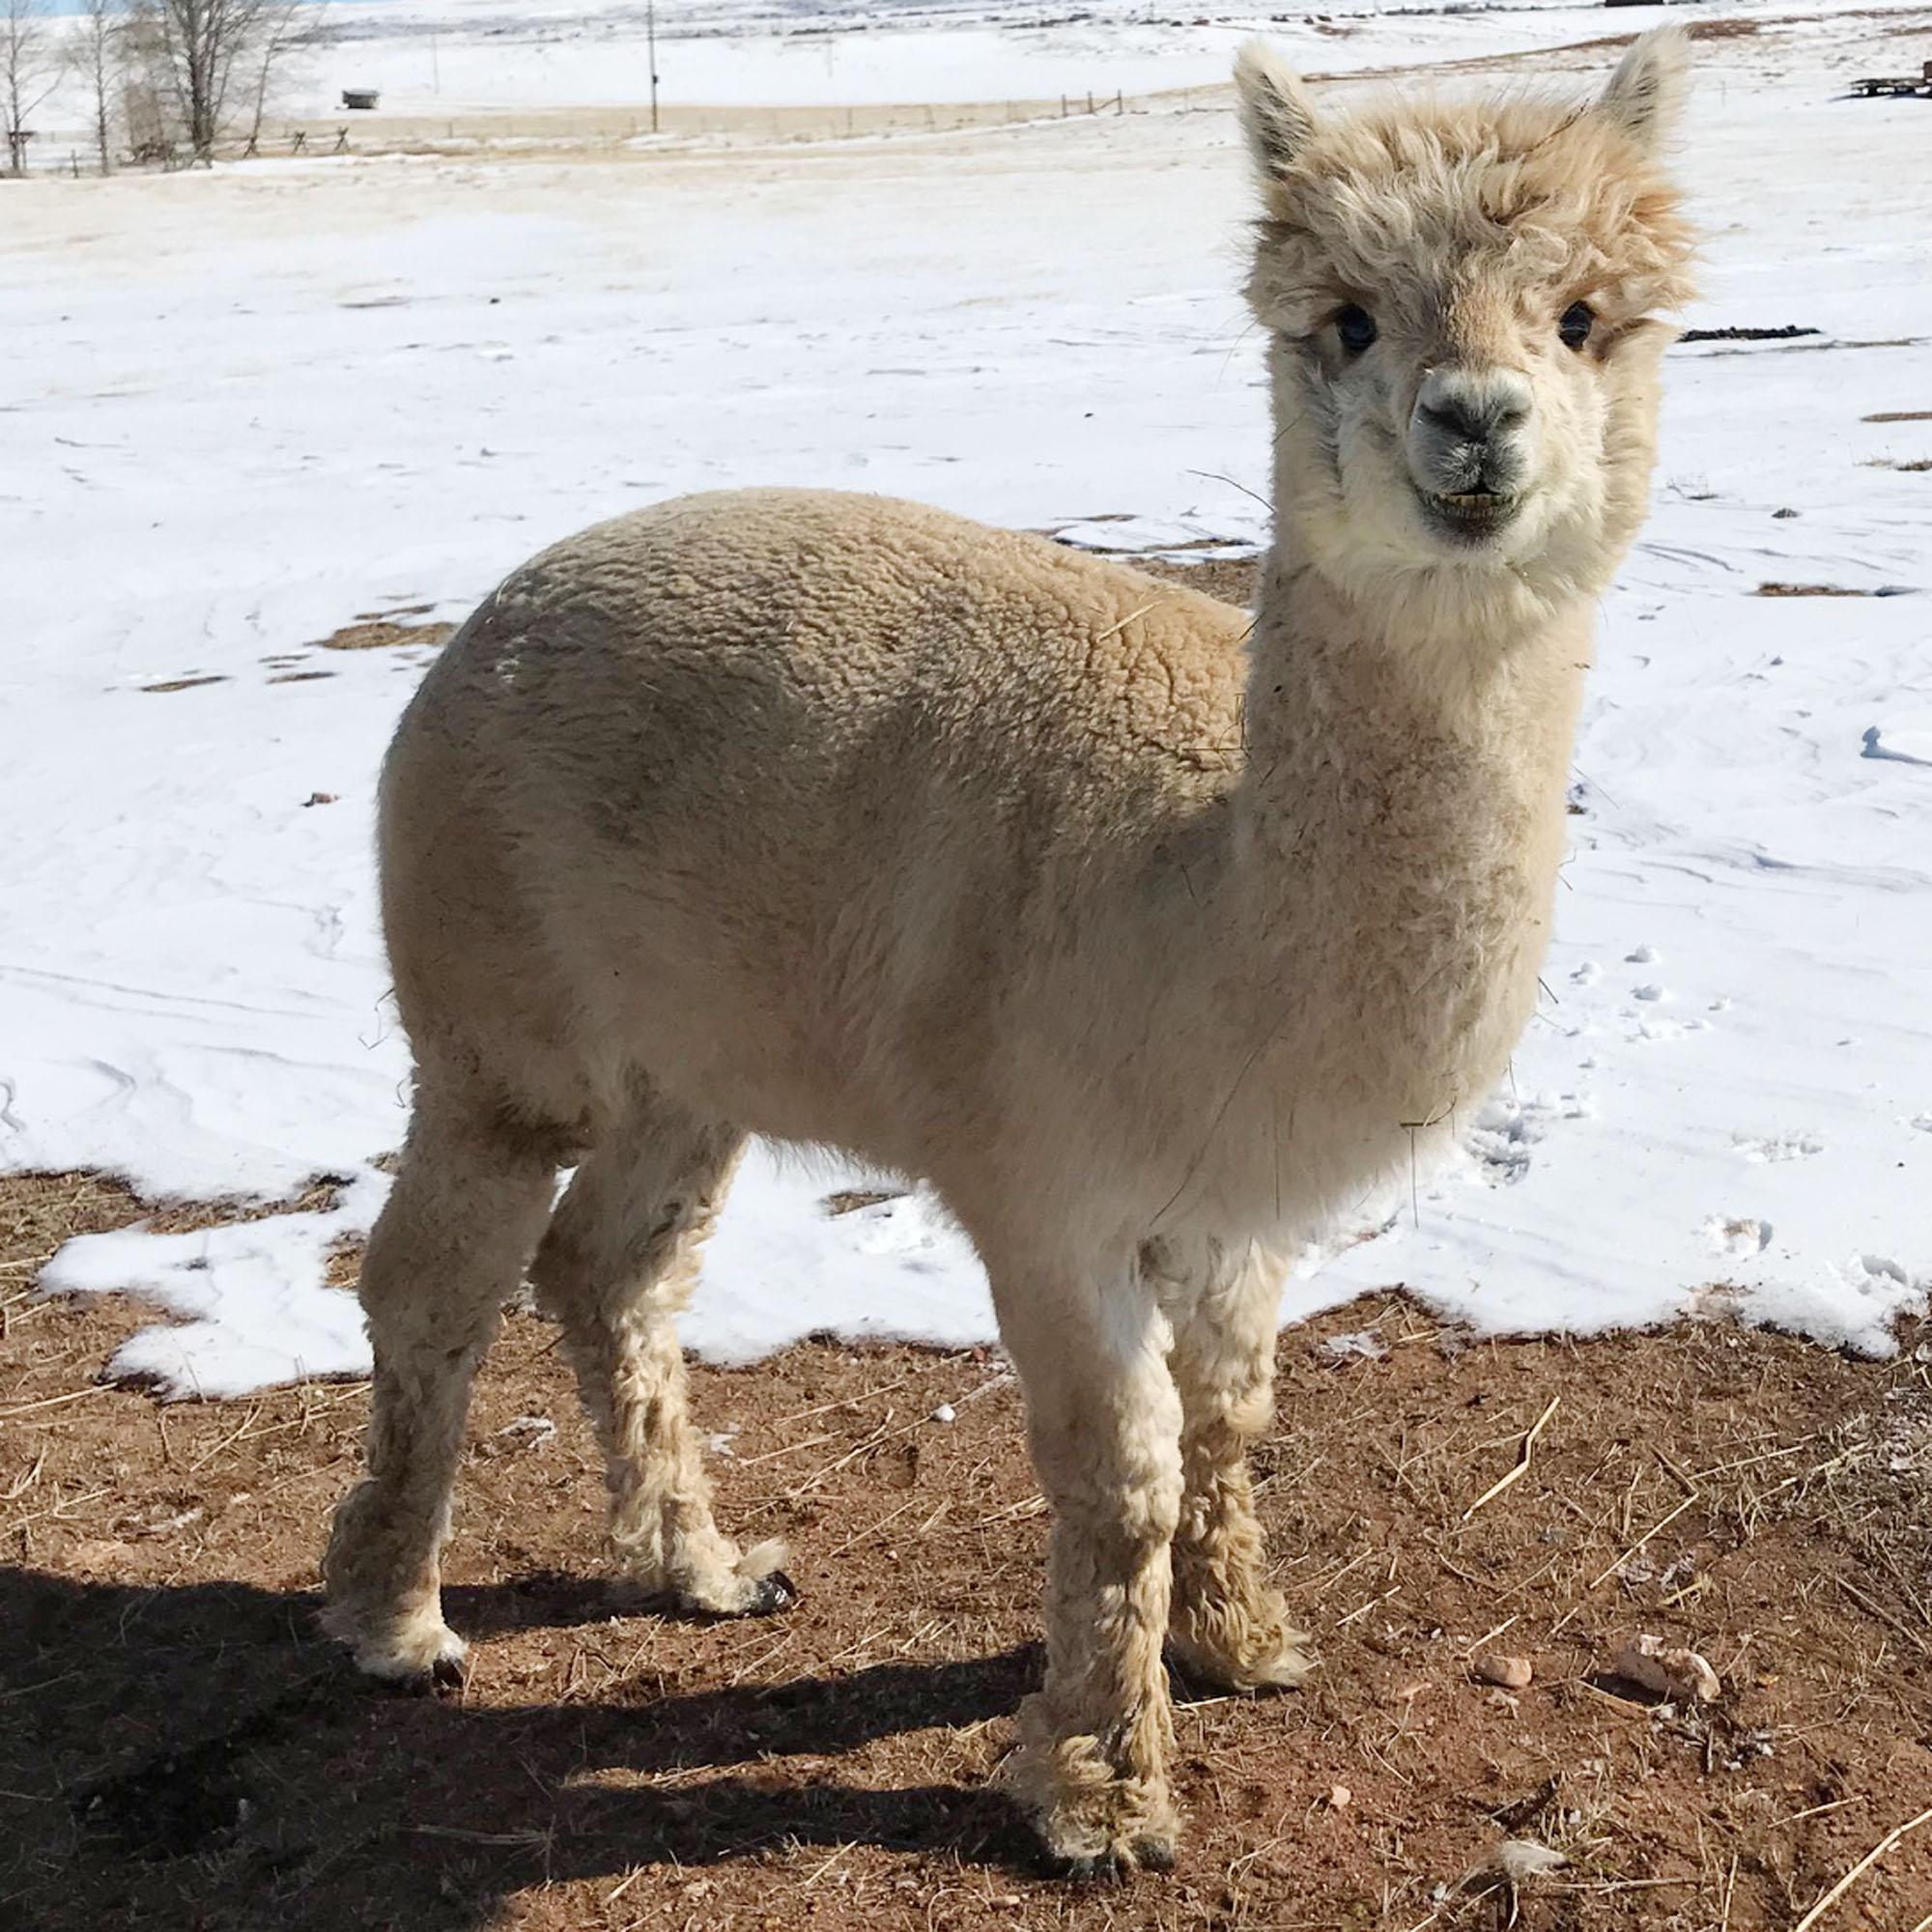 Mervin the alpaca